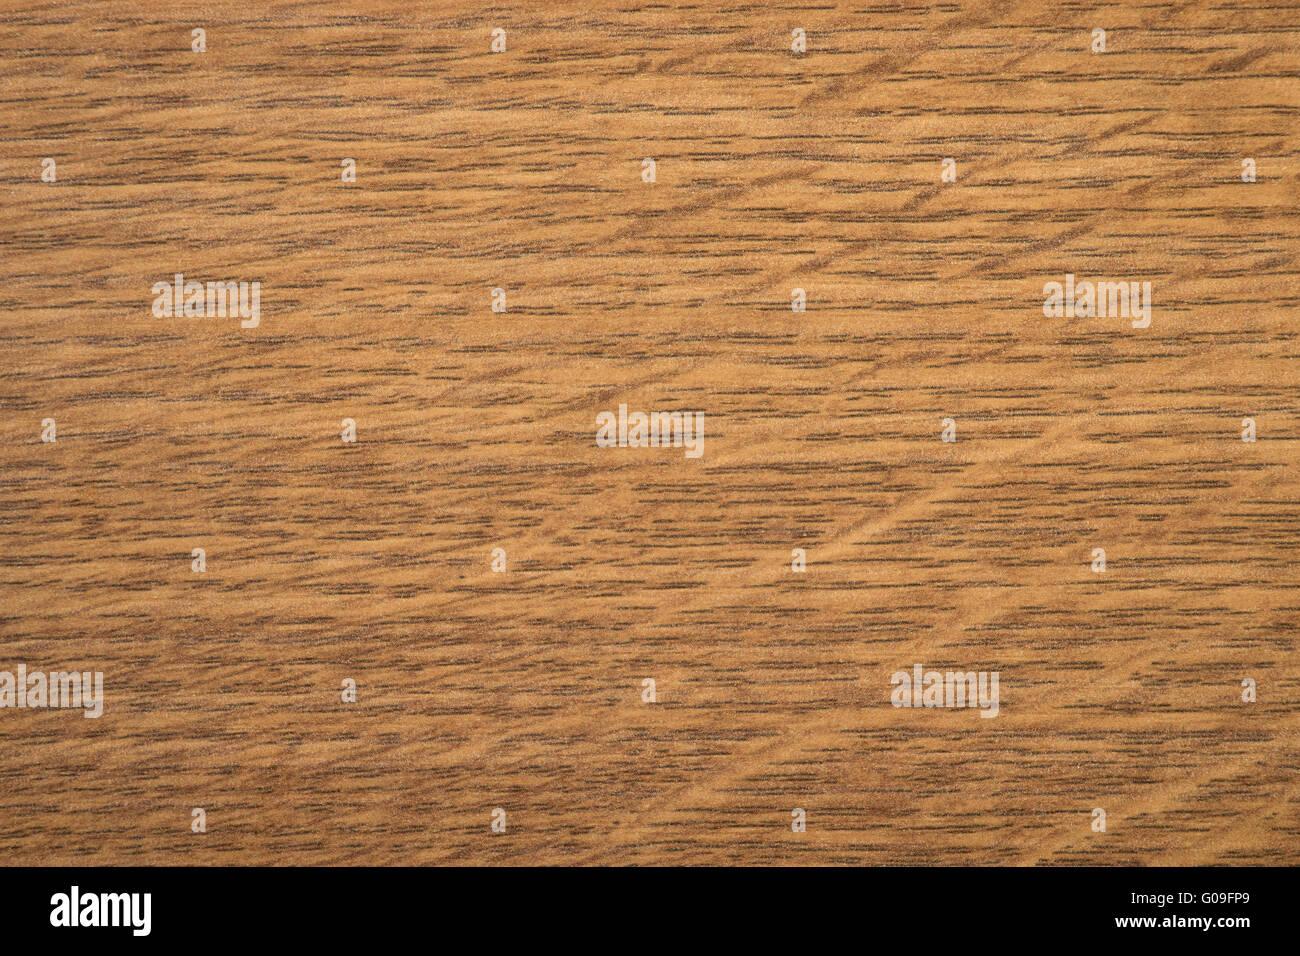 Rustical oak Wooden texture - Stock Image